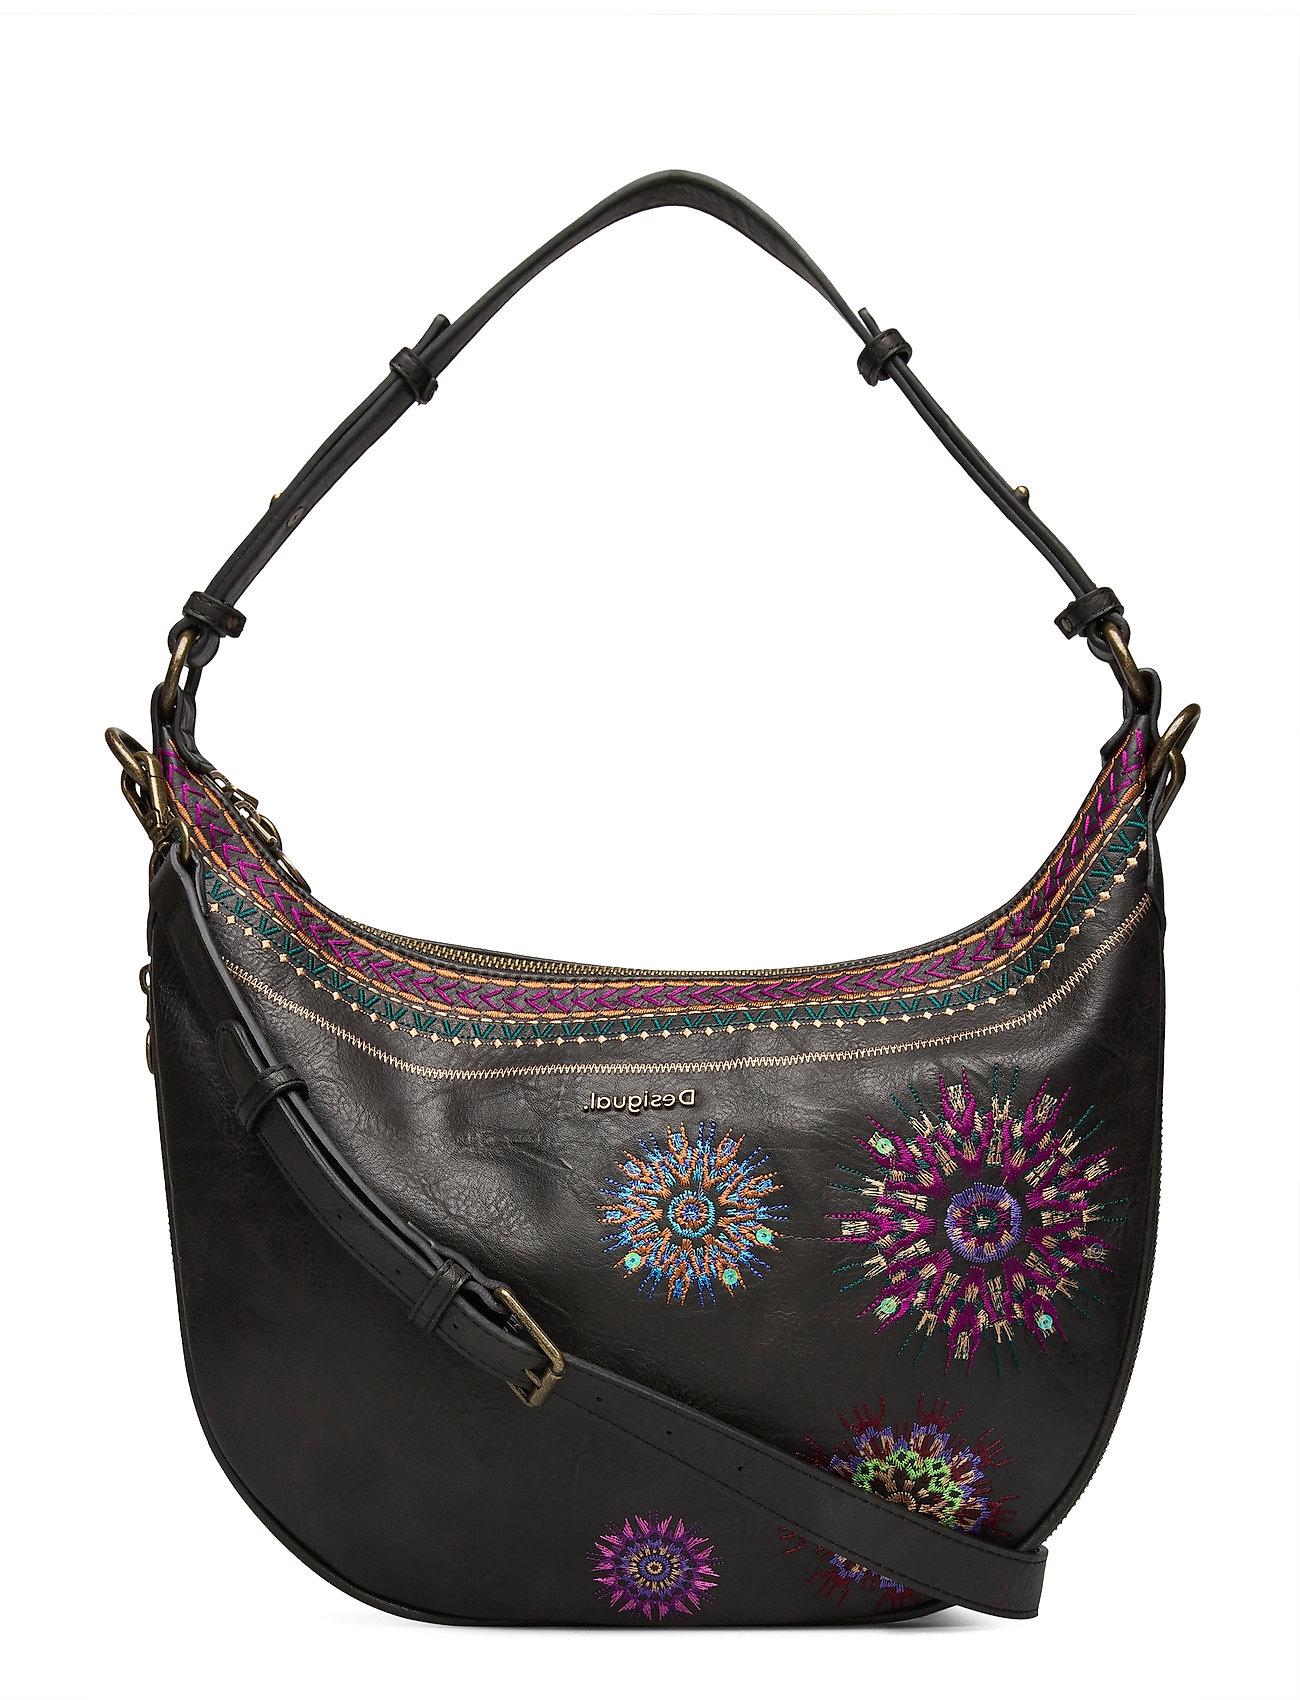 Image of Bols Astoria Sibe Bags Top Handle Bags Sort Desigual Accessories (3452230109)